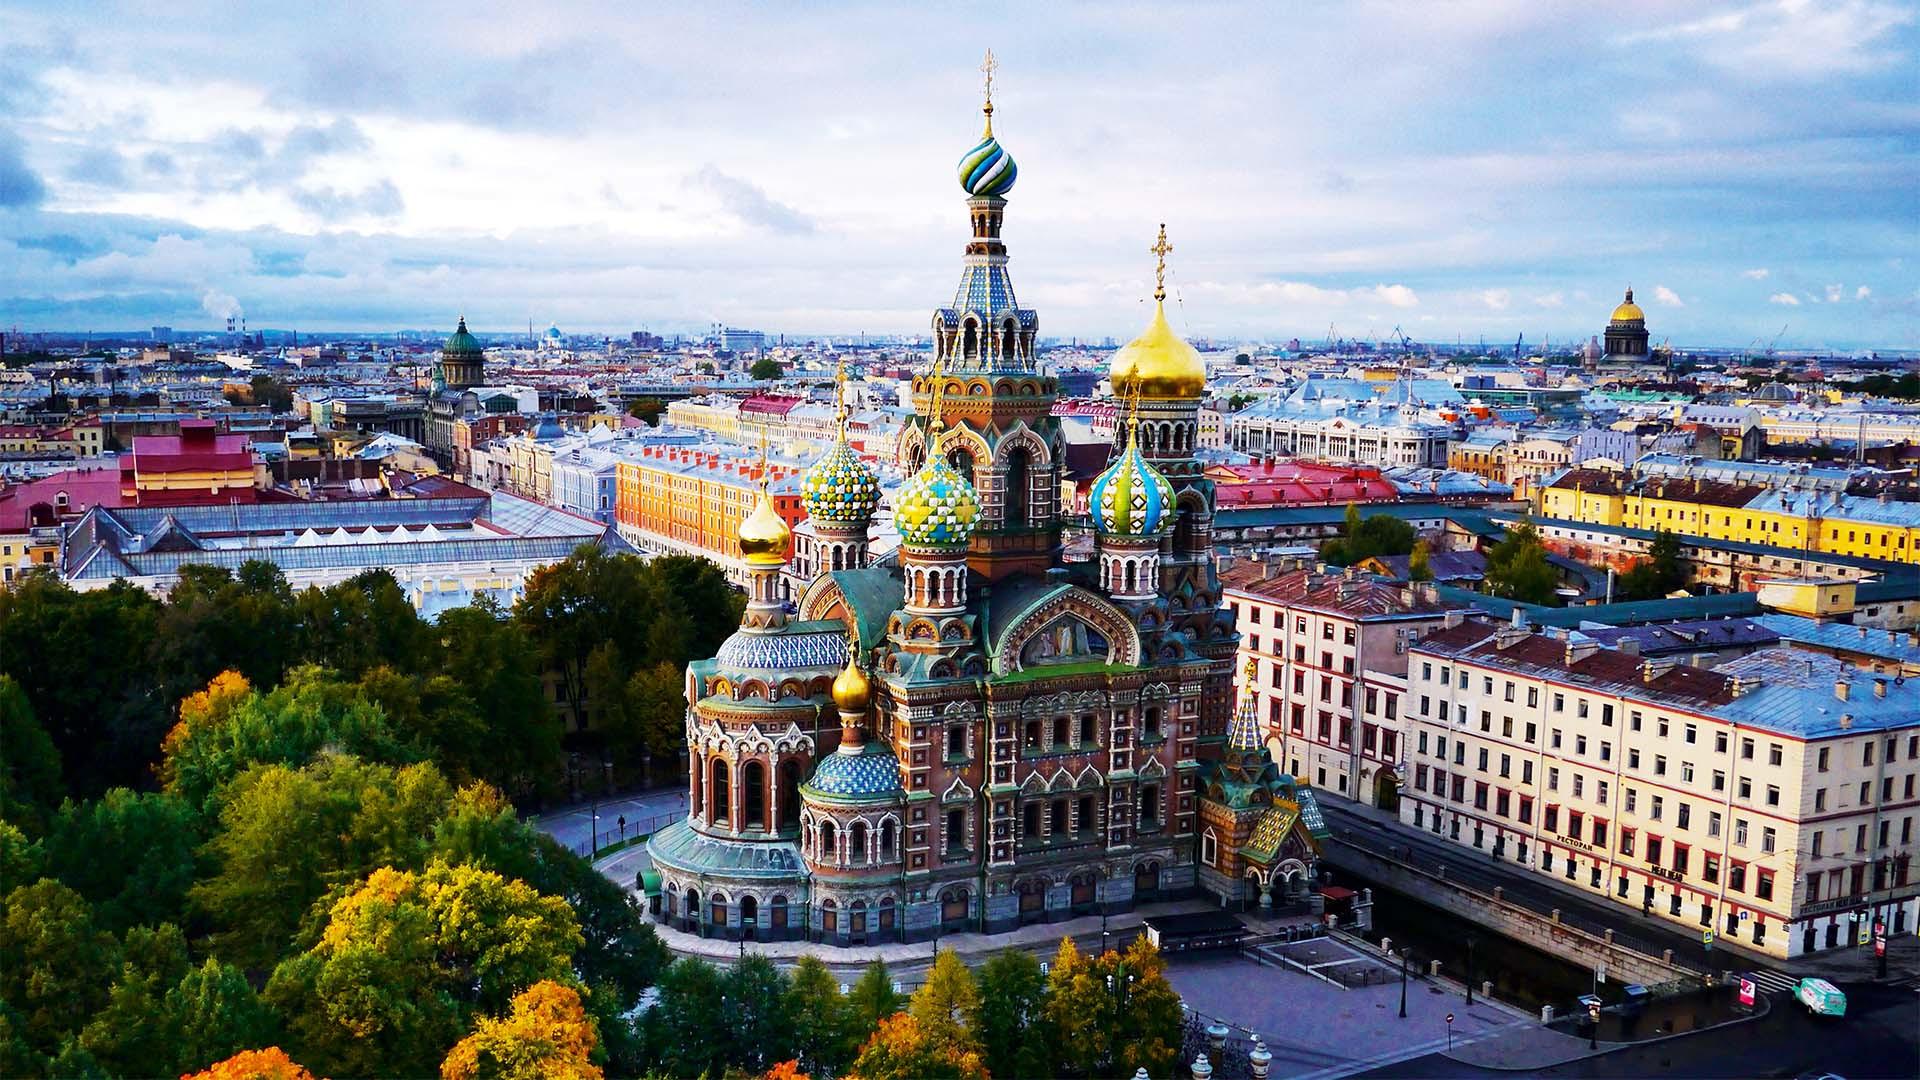 Aerial view over St Petersburg